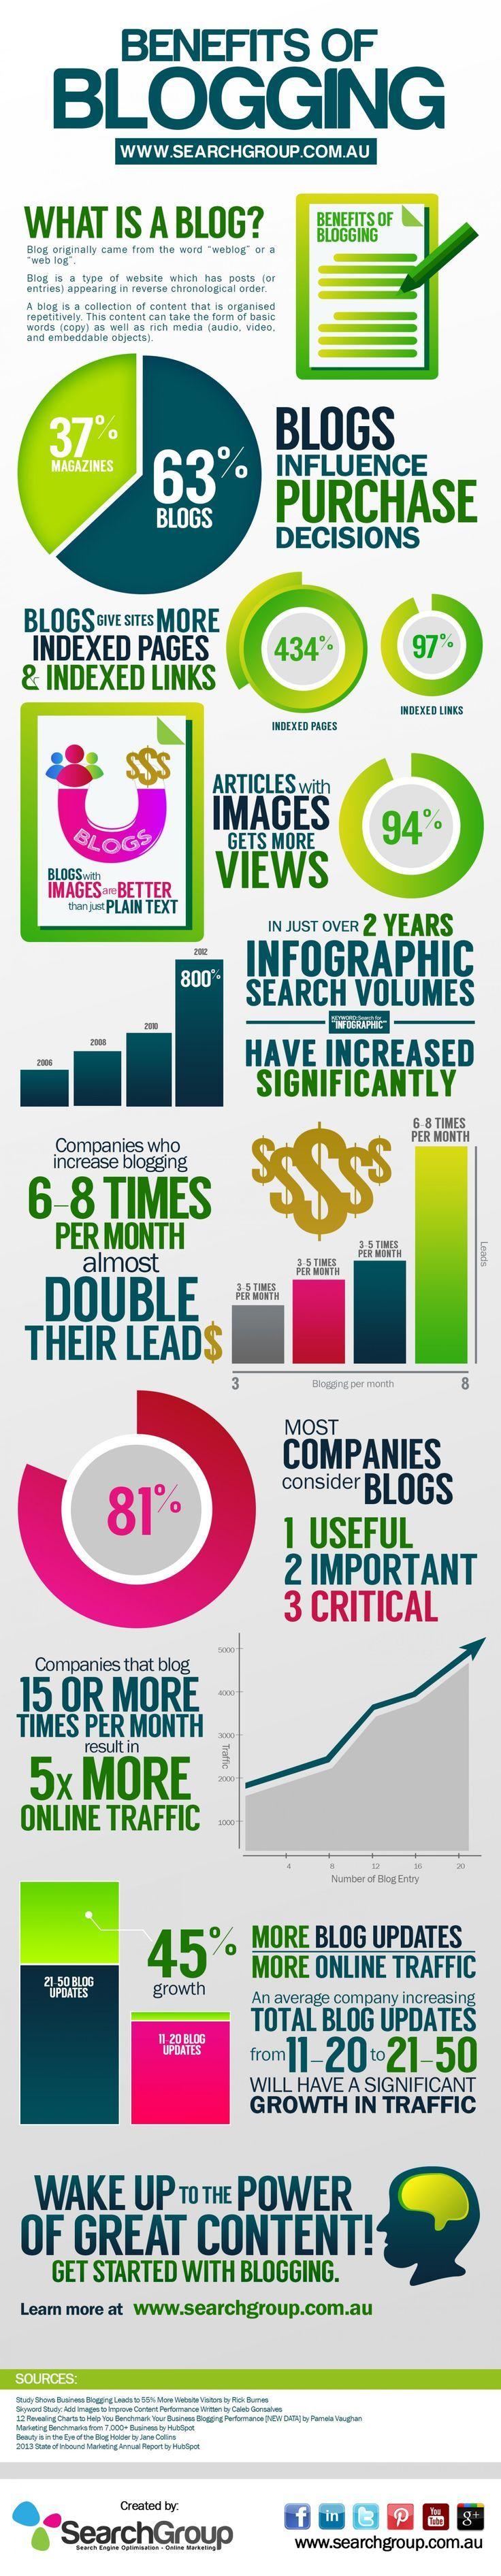 Benefits of Blogging Infographic